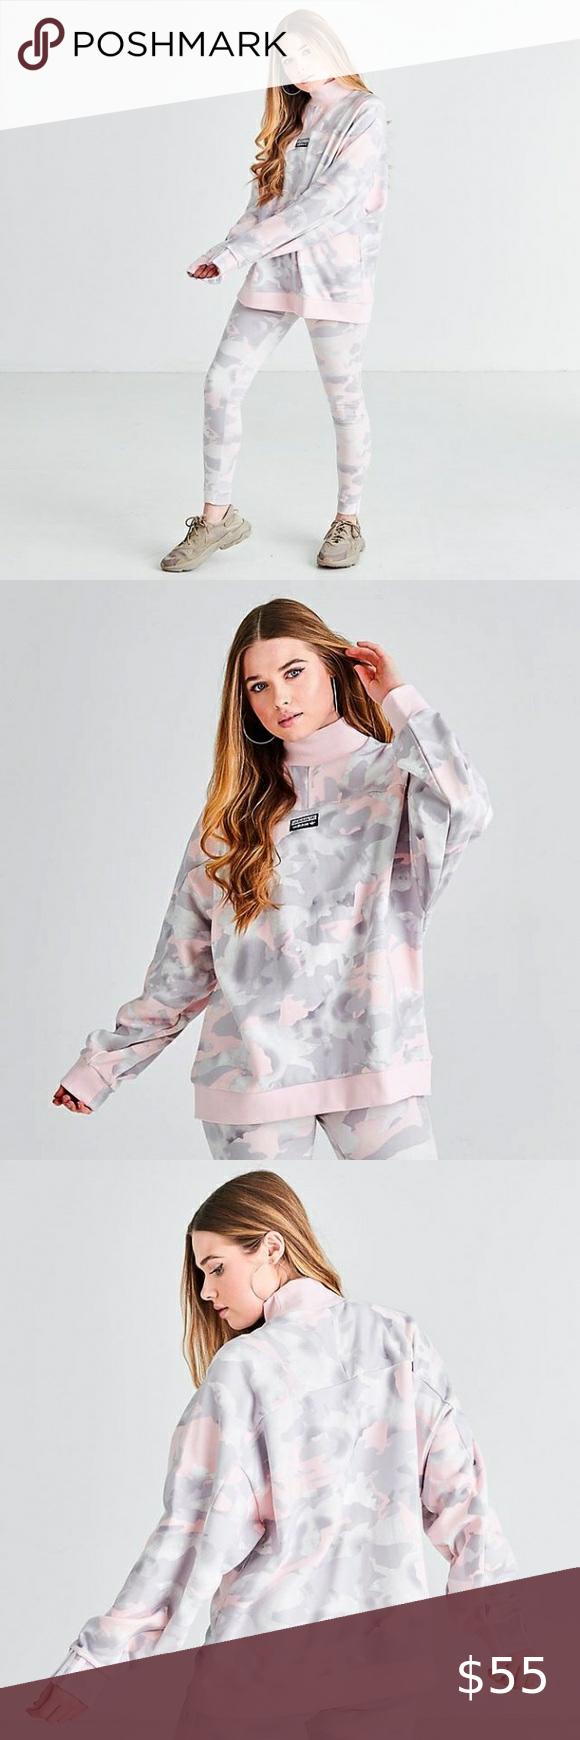 New Adidas Originals Pastel Camo Sweatshirt Xl Camouflage Sweatshirt Camo Sweatshirt New Adidas [ 1740 x 580 Pixel ]